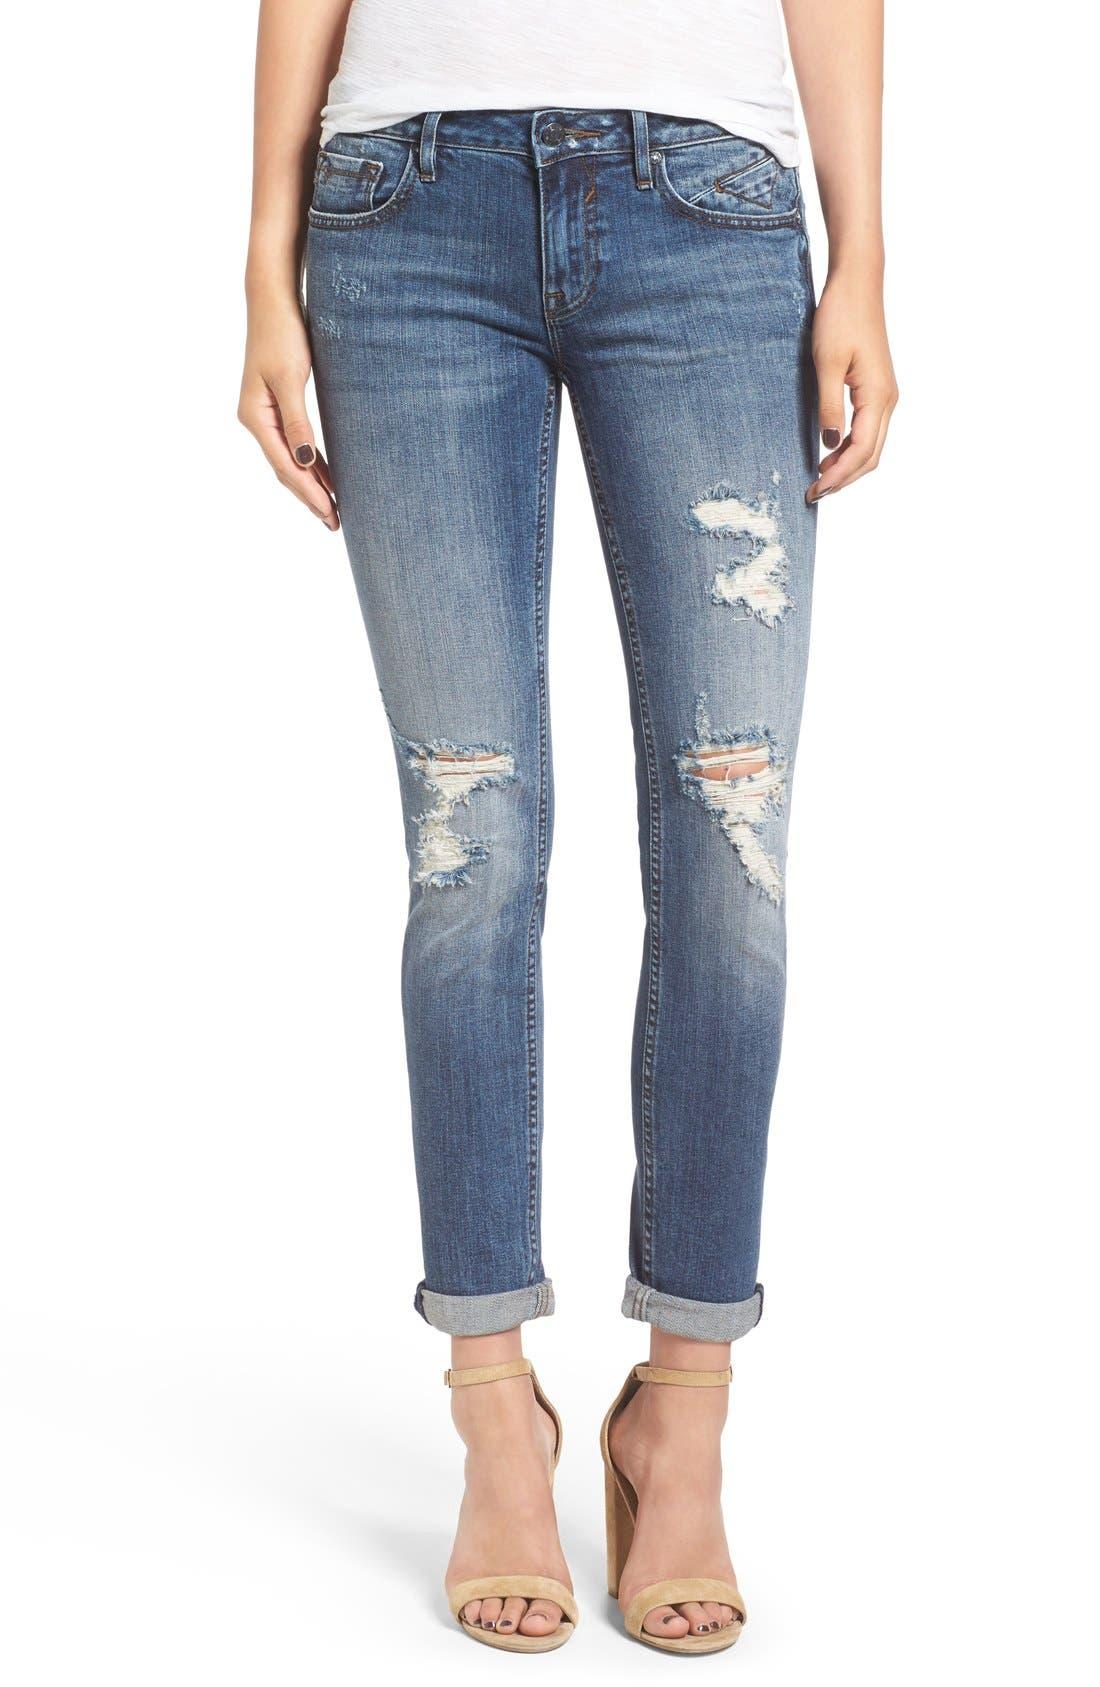 VIGOSS 'Thompson Tomboy' Ripped Boyfriend Jeans, Main, color, 400